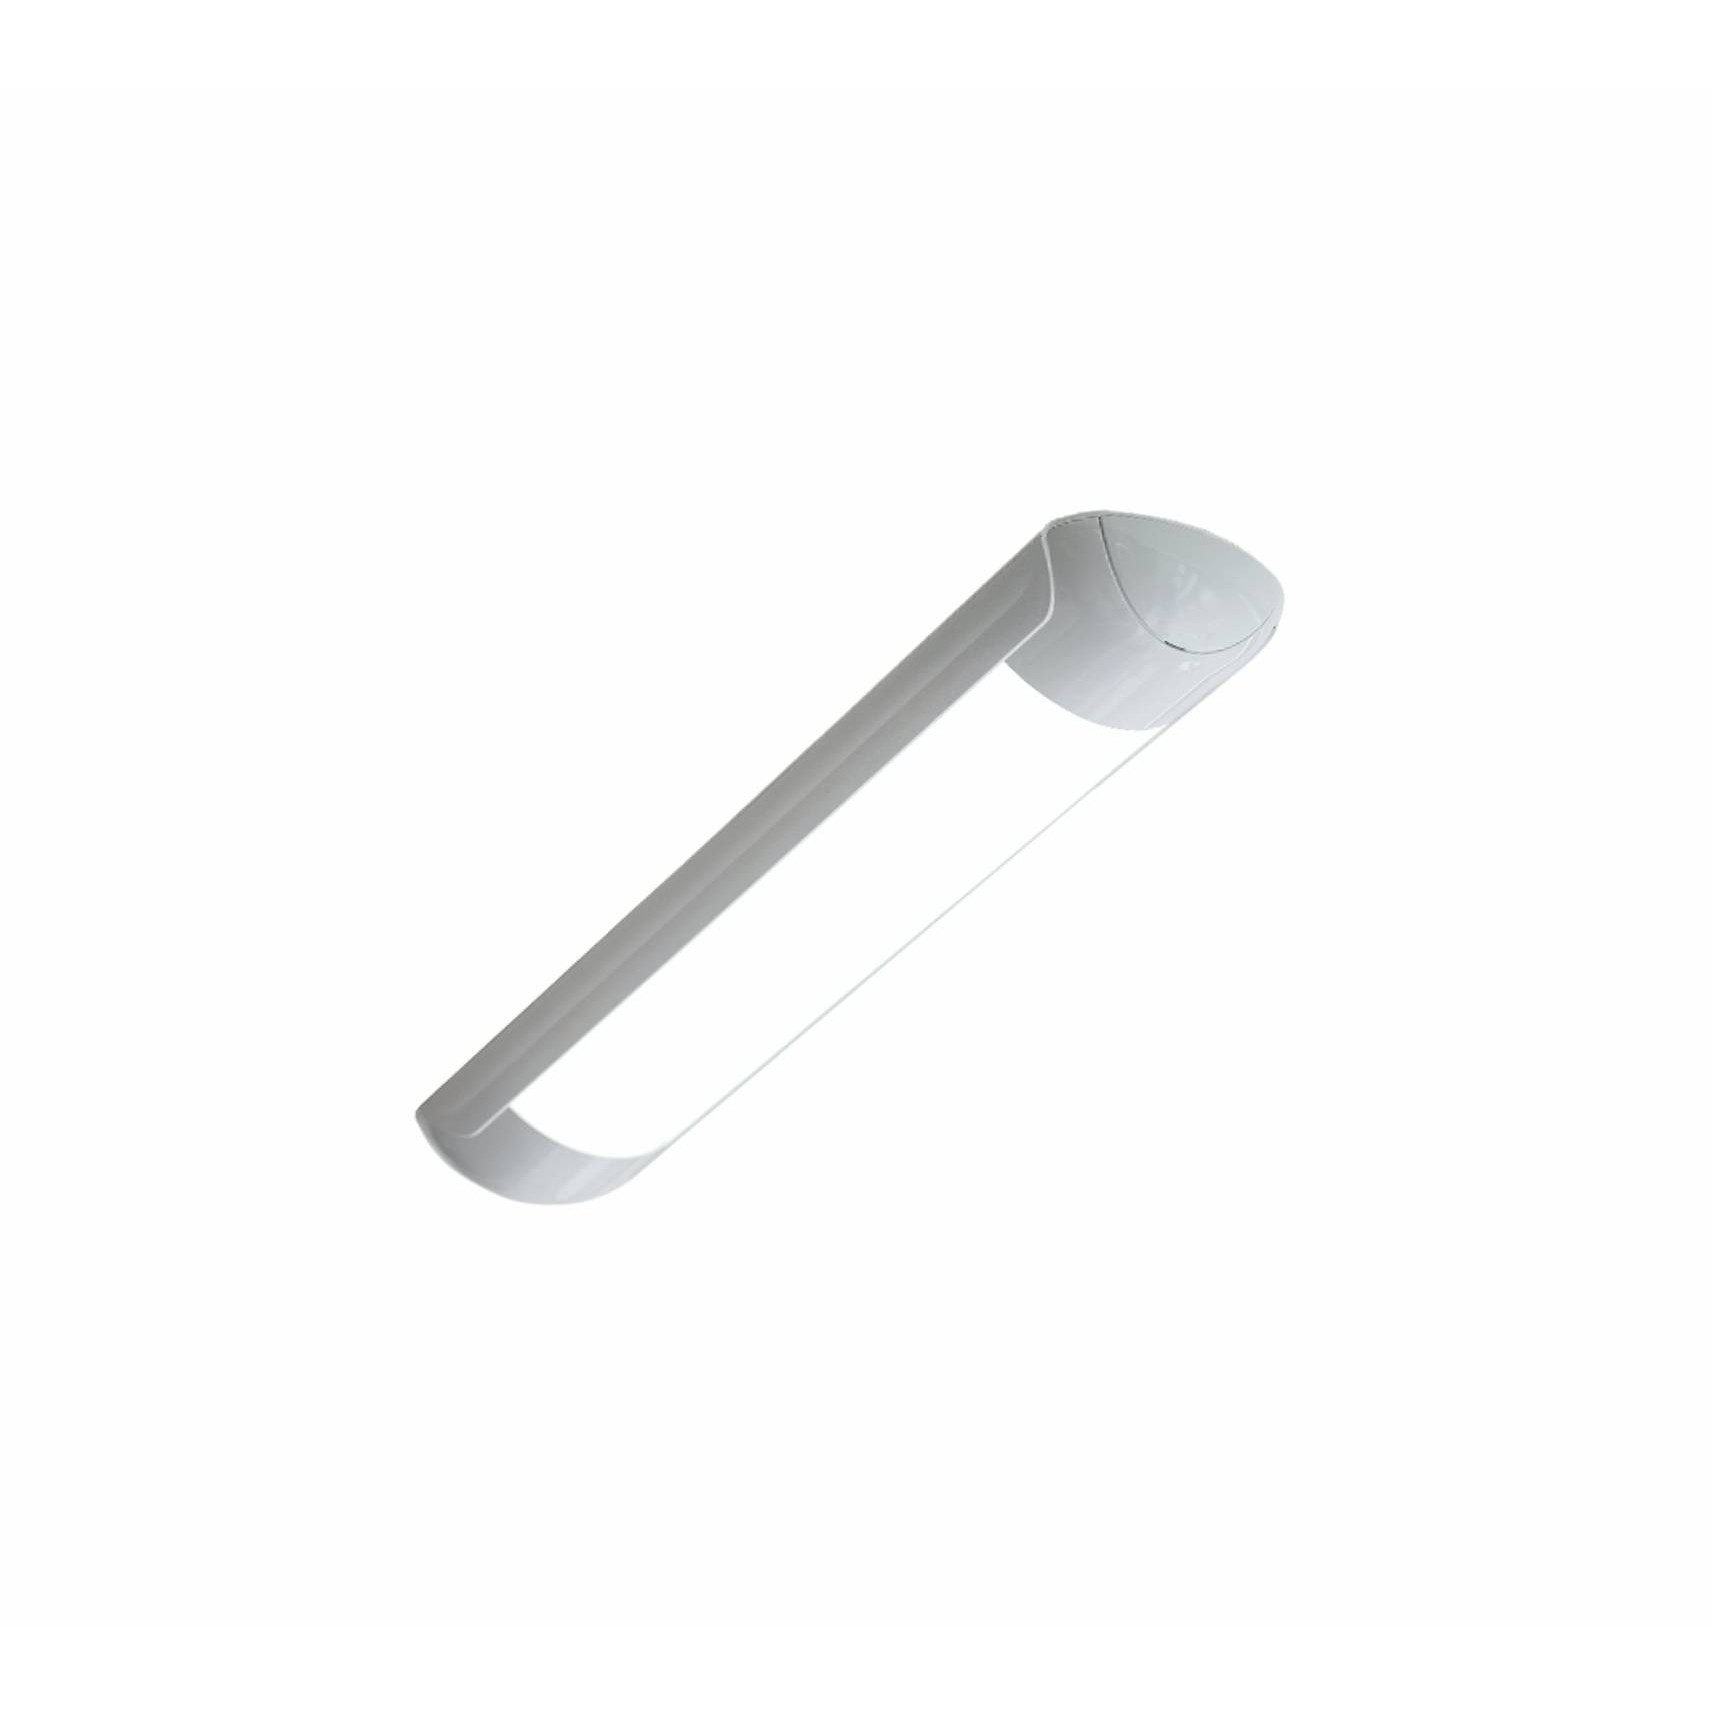 Luminaria de Sobrepor LED 60cm 18W Branca Bivolt - Glight